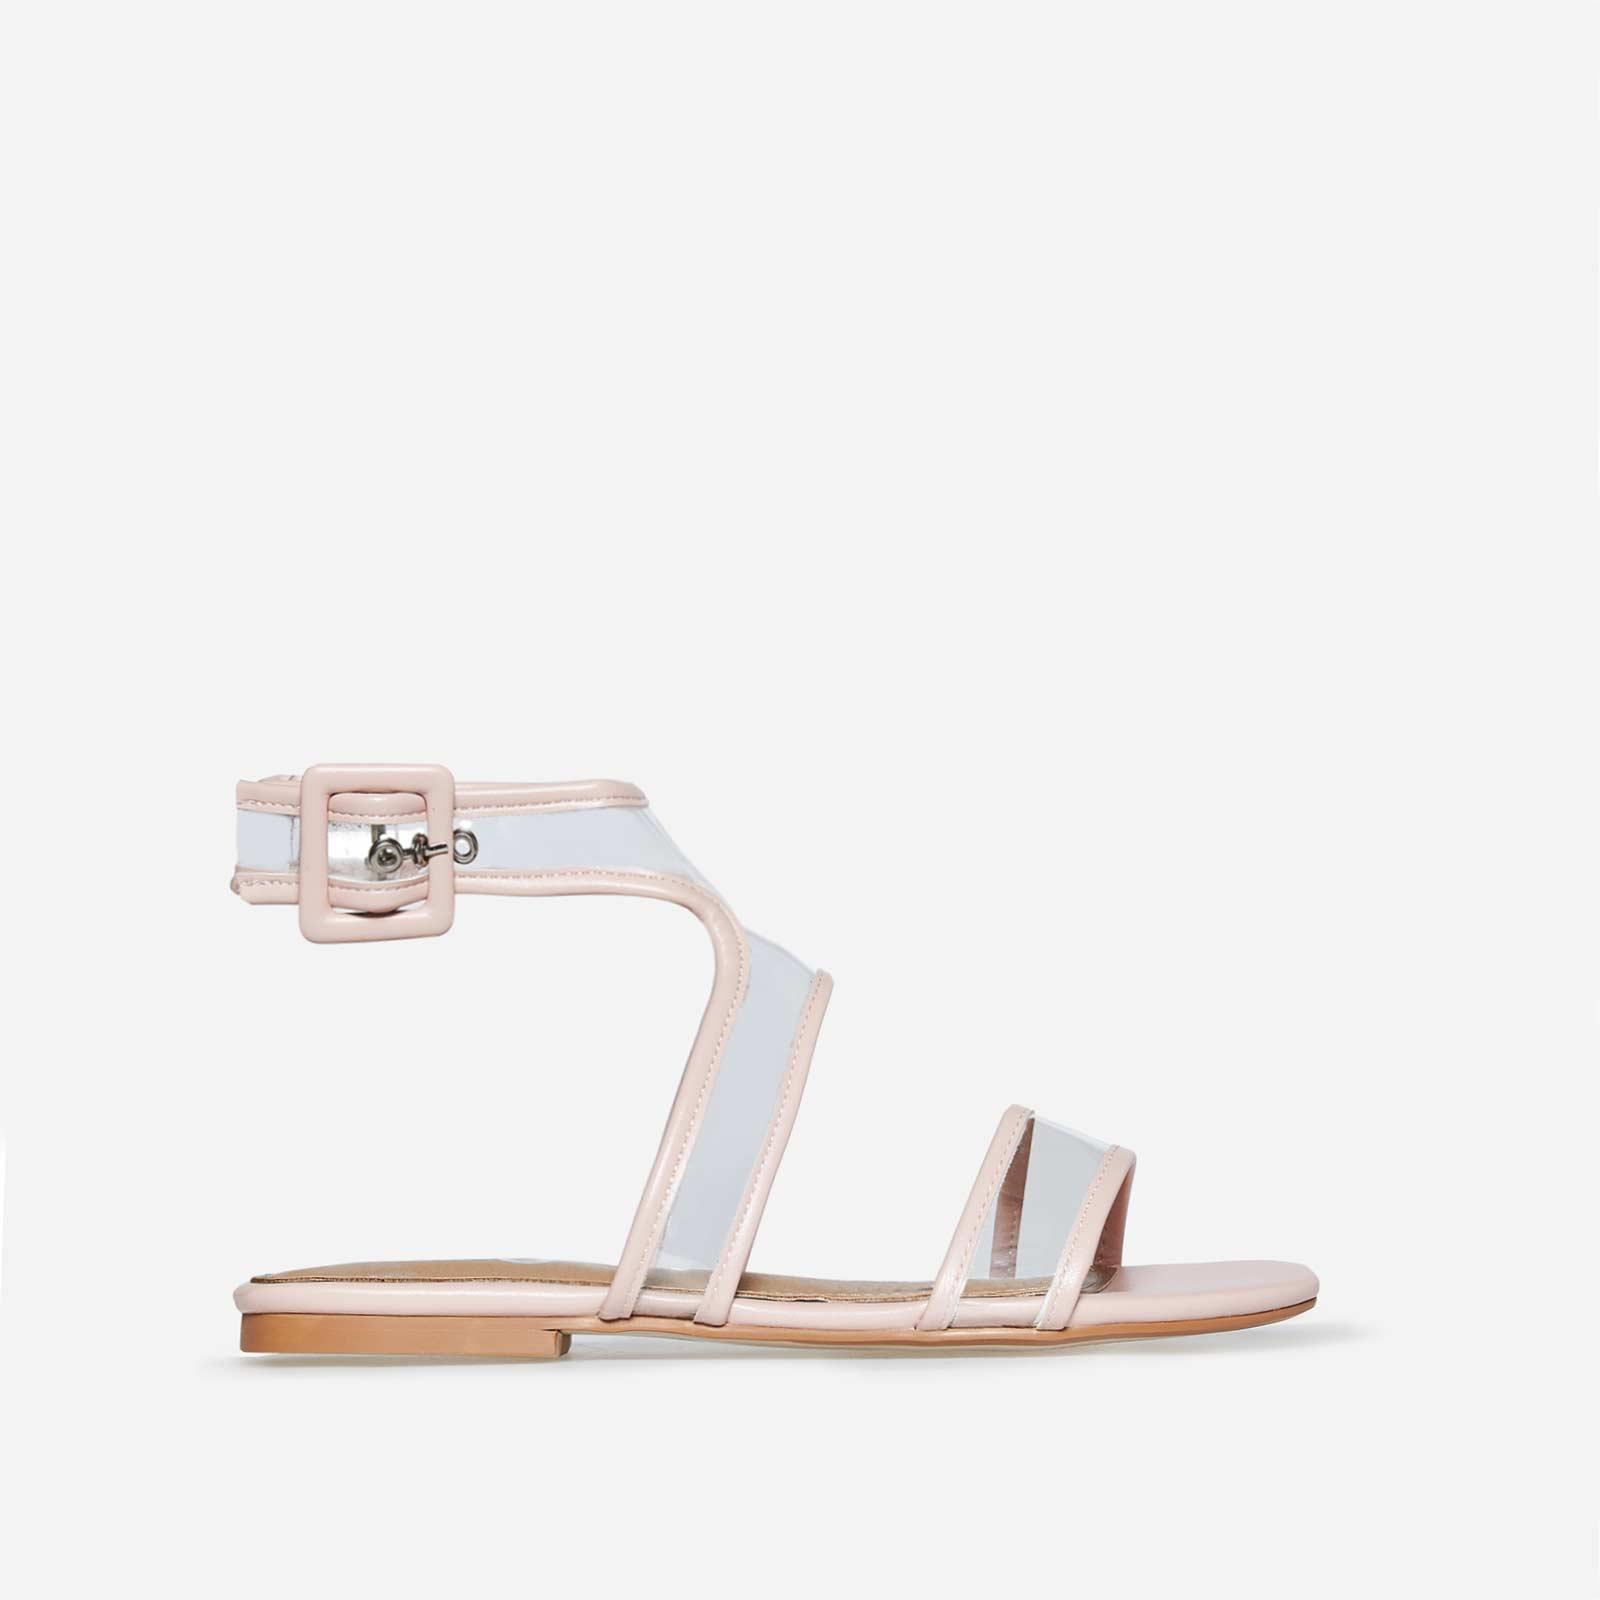 Rita Perspex Sandal In Pink Faux Leather